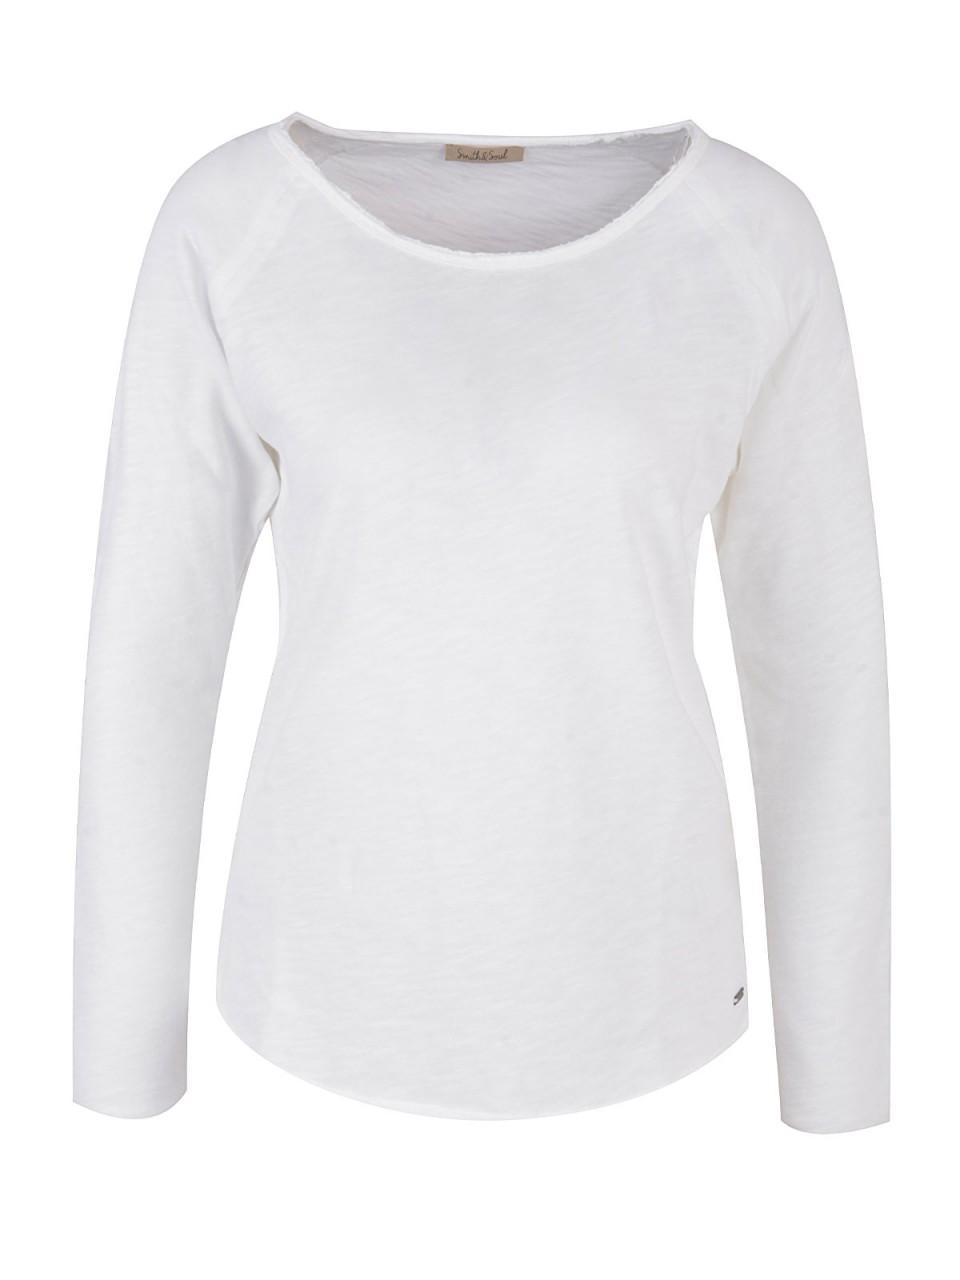 Oberteile - SMITH SOUL Damen Shirt, creme  - Onlineshop Designermode.com